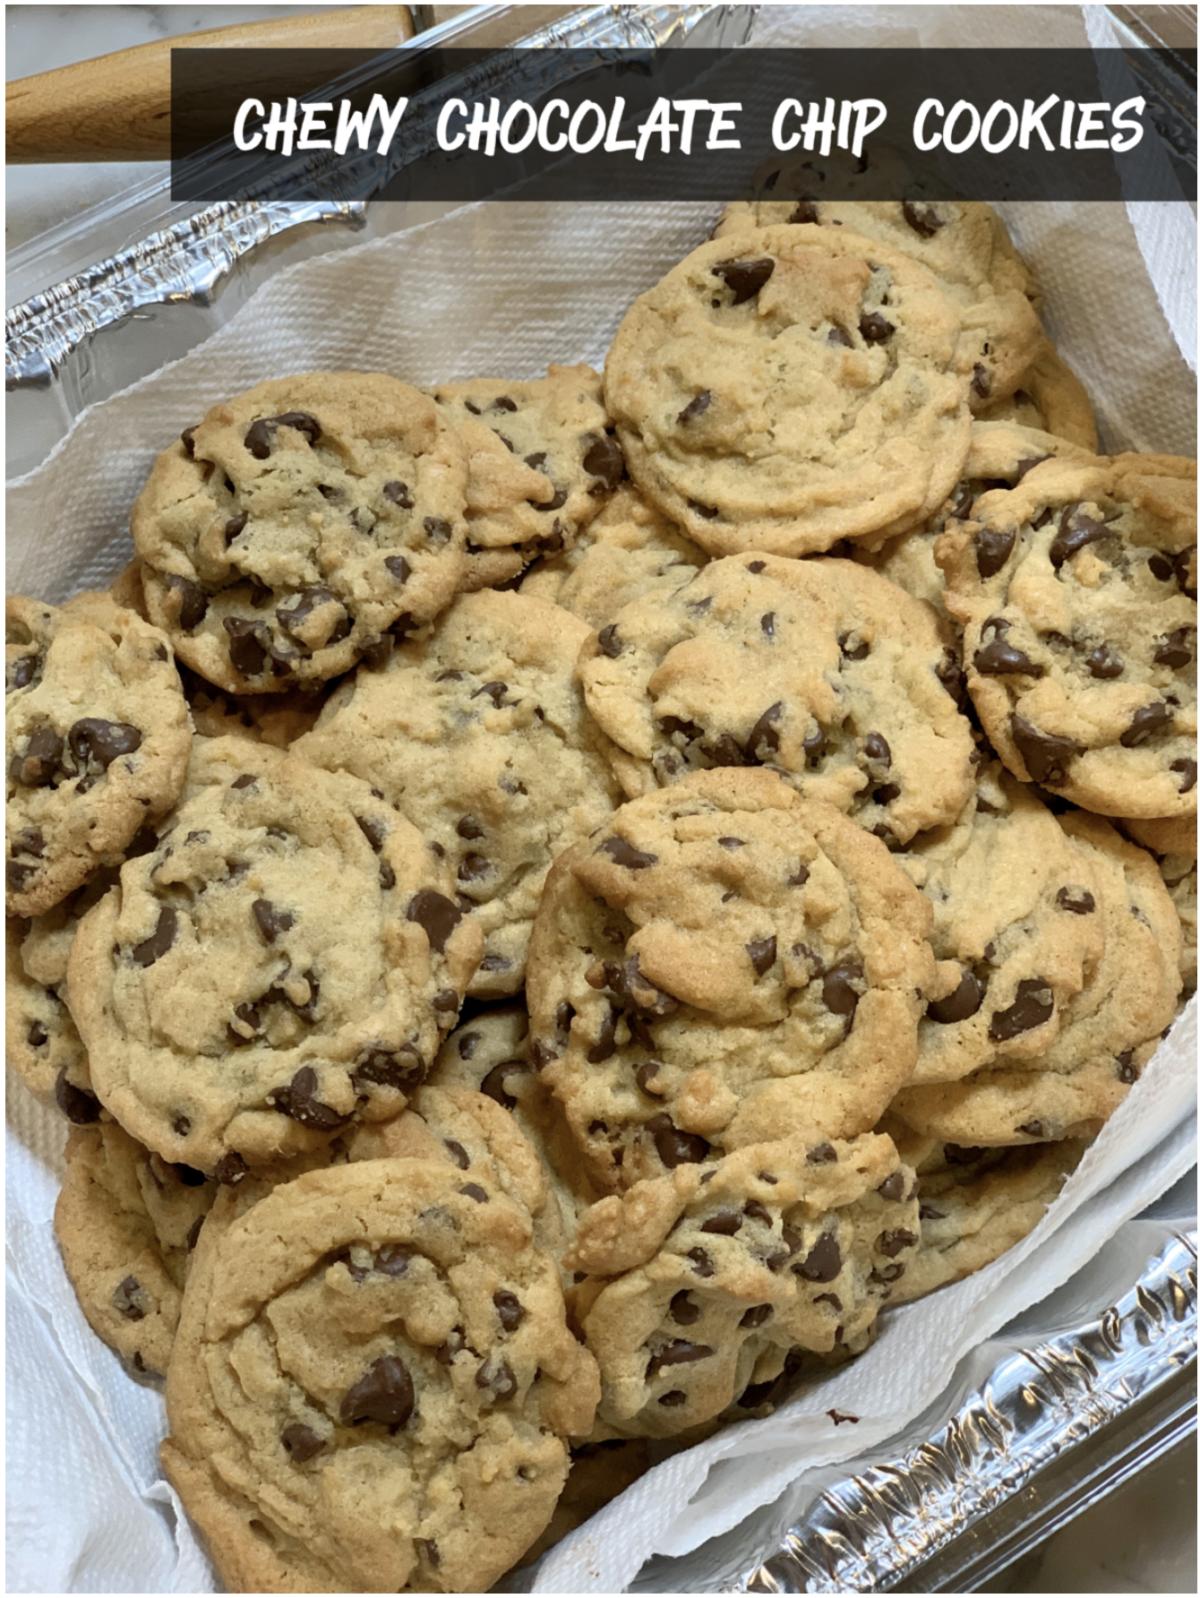 Rhonda's Chewy Chocolate Chip Cookies